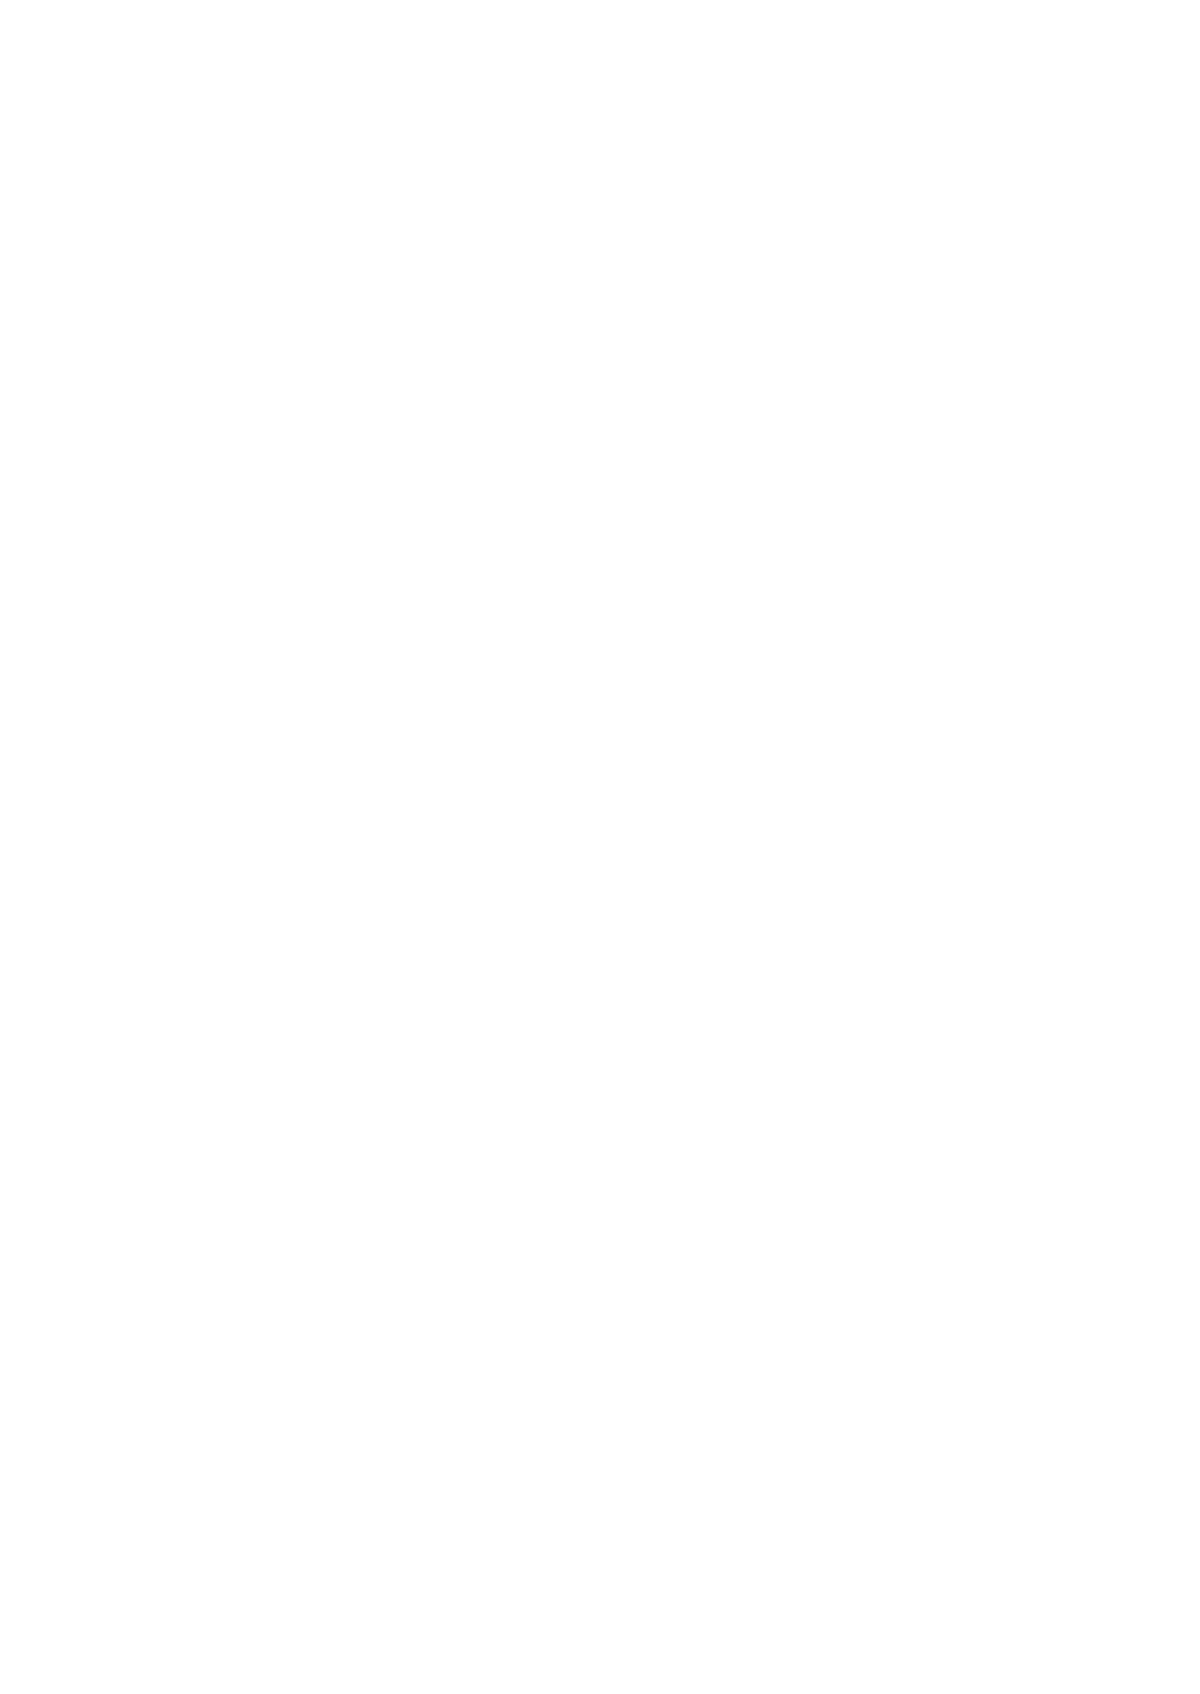 [Tomato Nouen (Abutomato)] Futari no Jikan + Futari no Jikan -Zoku- | Our time together + Our time together - continuation - (Puella Magi Madoka Magica) [English] [Tabunne Scans] [Digital] 2